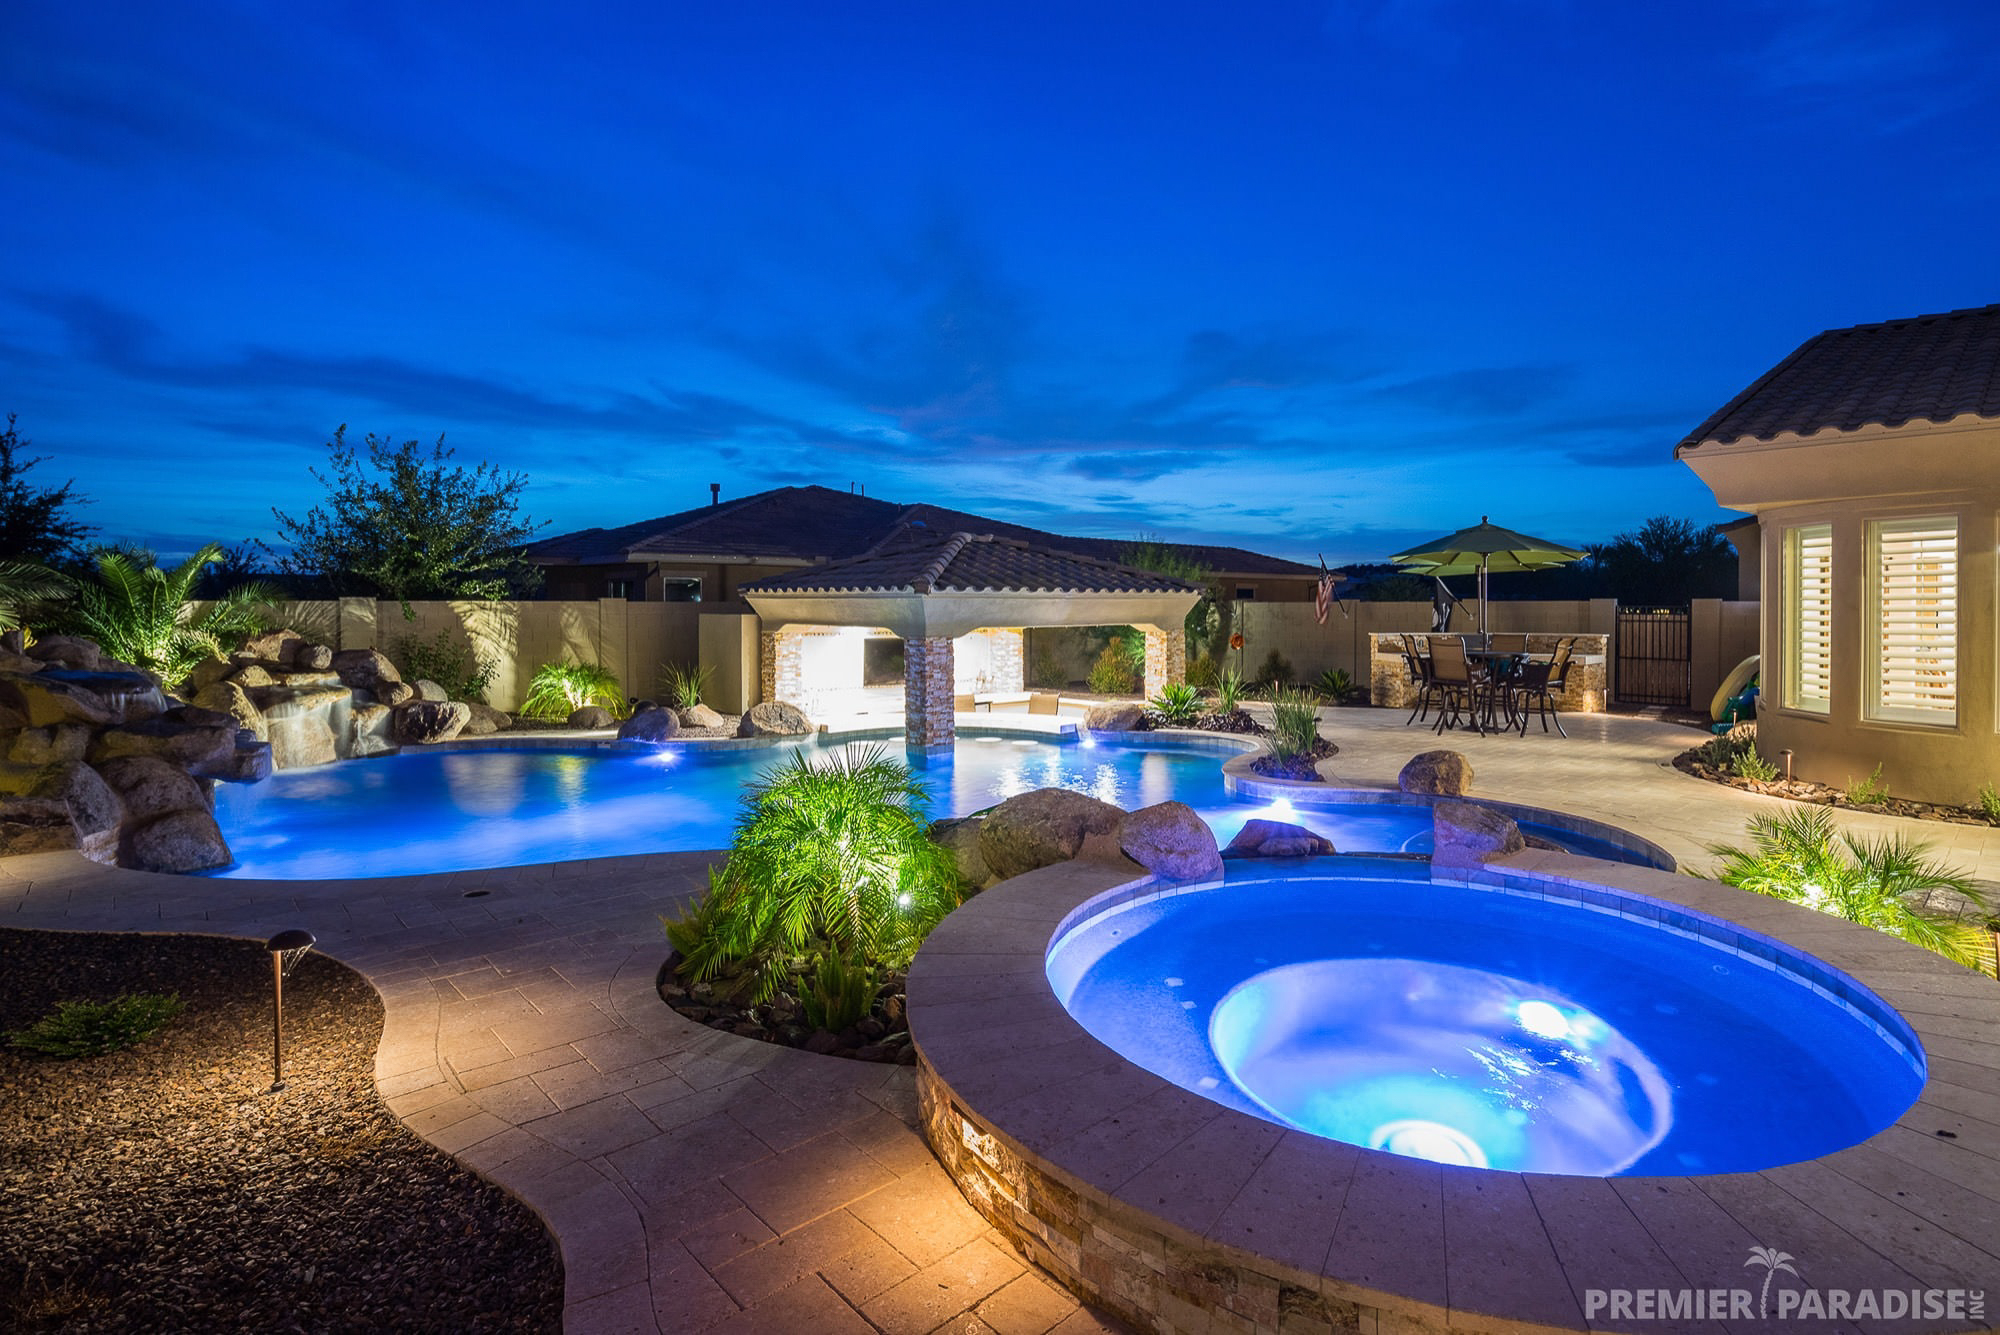 premier-paradise-inc-backyard-boulder-living-gilbert ... on Luxury Backyard Design id=47655